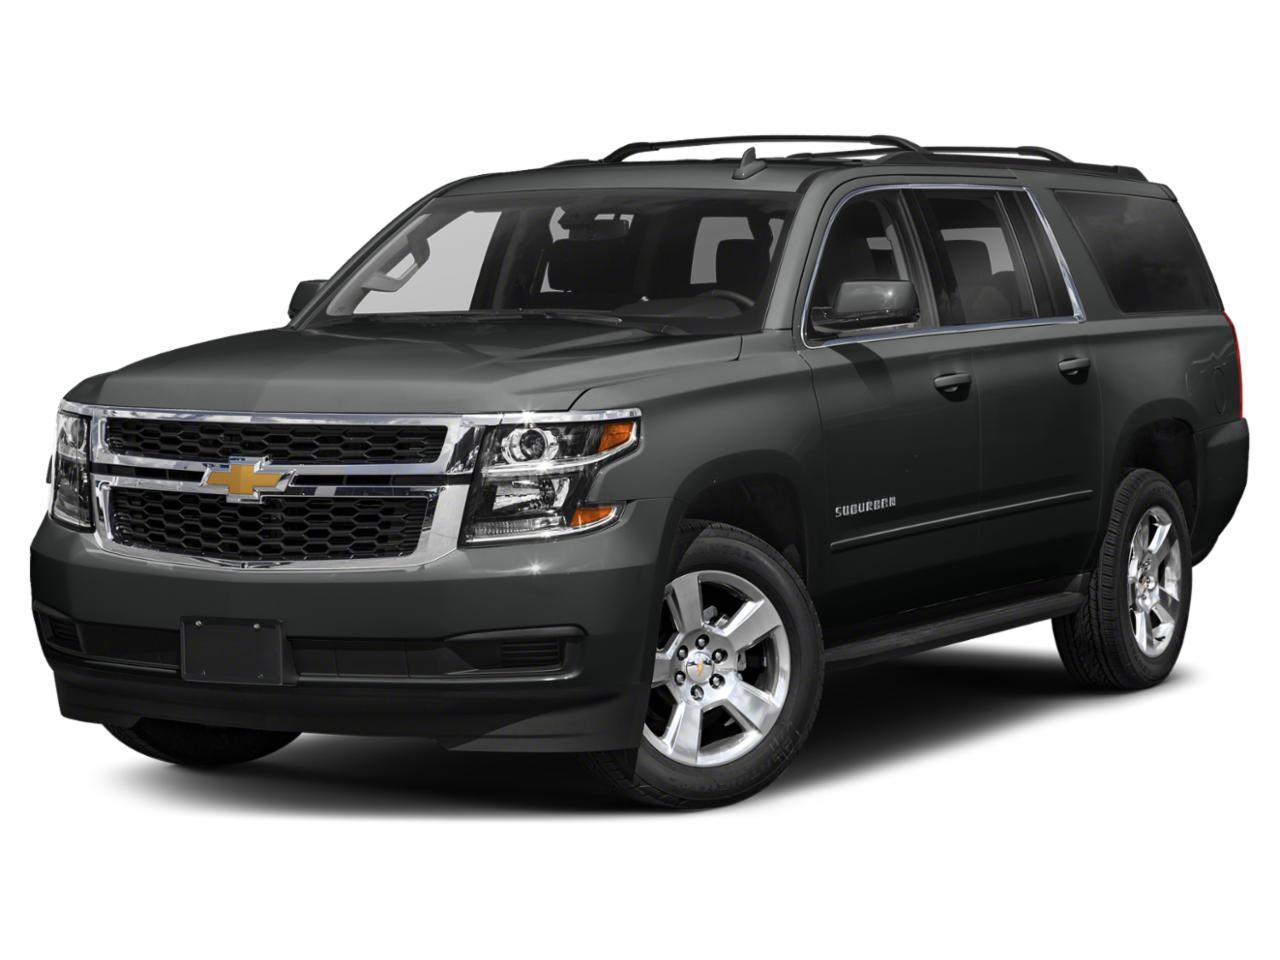 2019 Chevrolet Suburban Vehicle Photo in Odessa, TX 79762